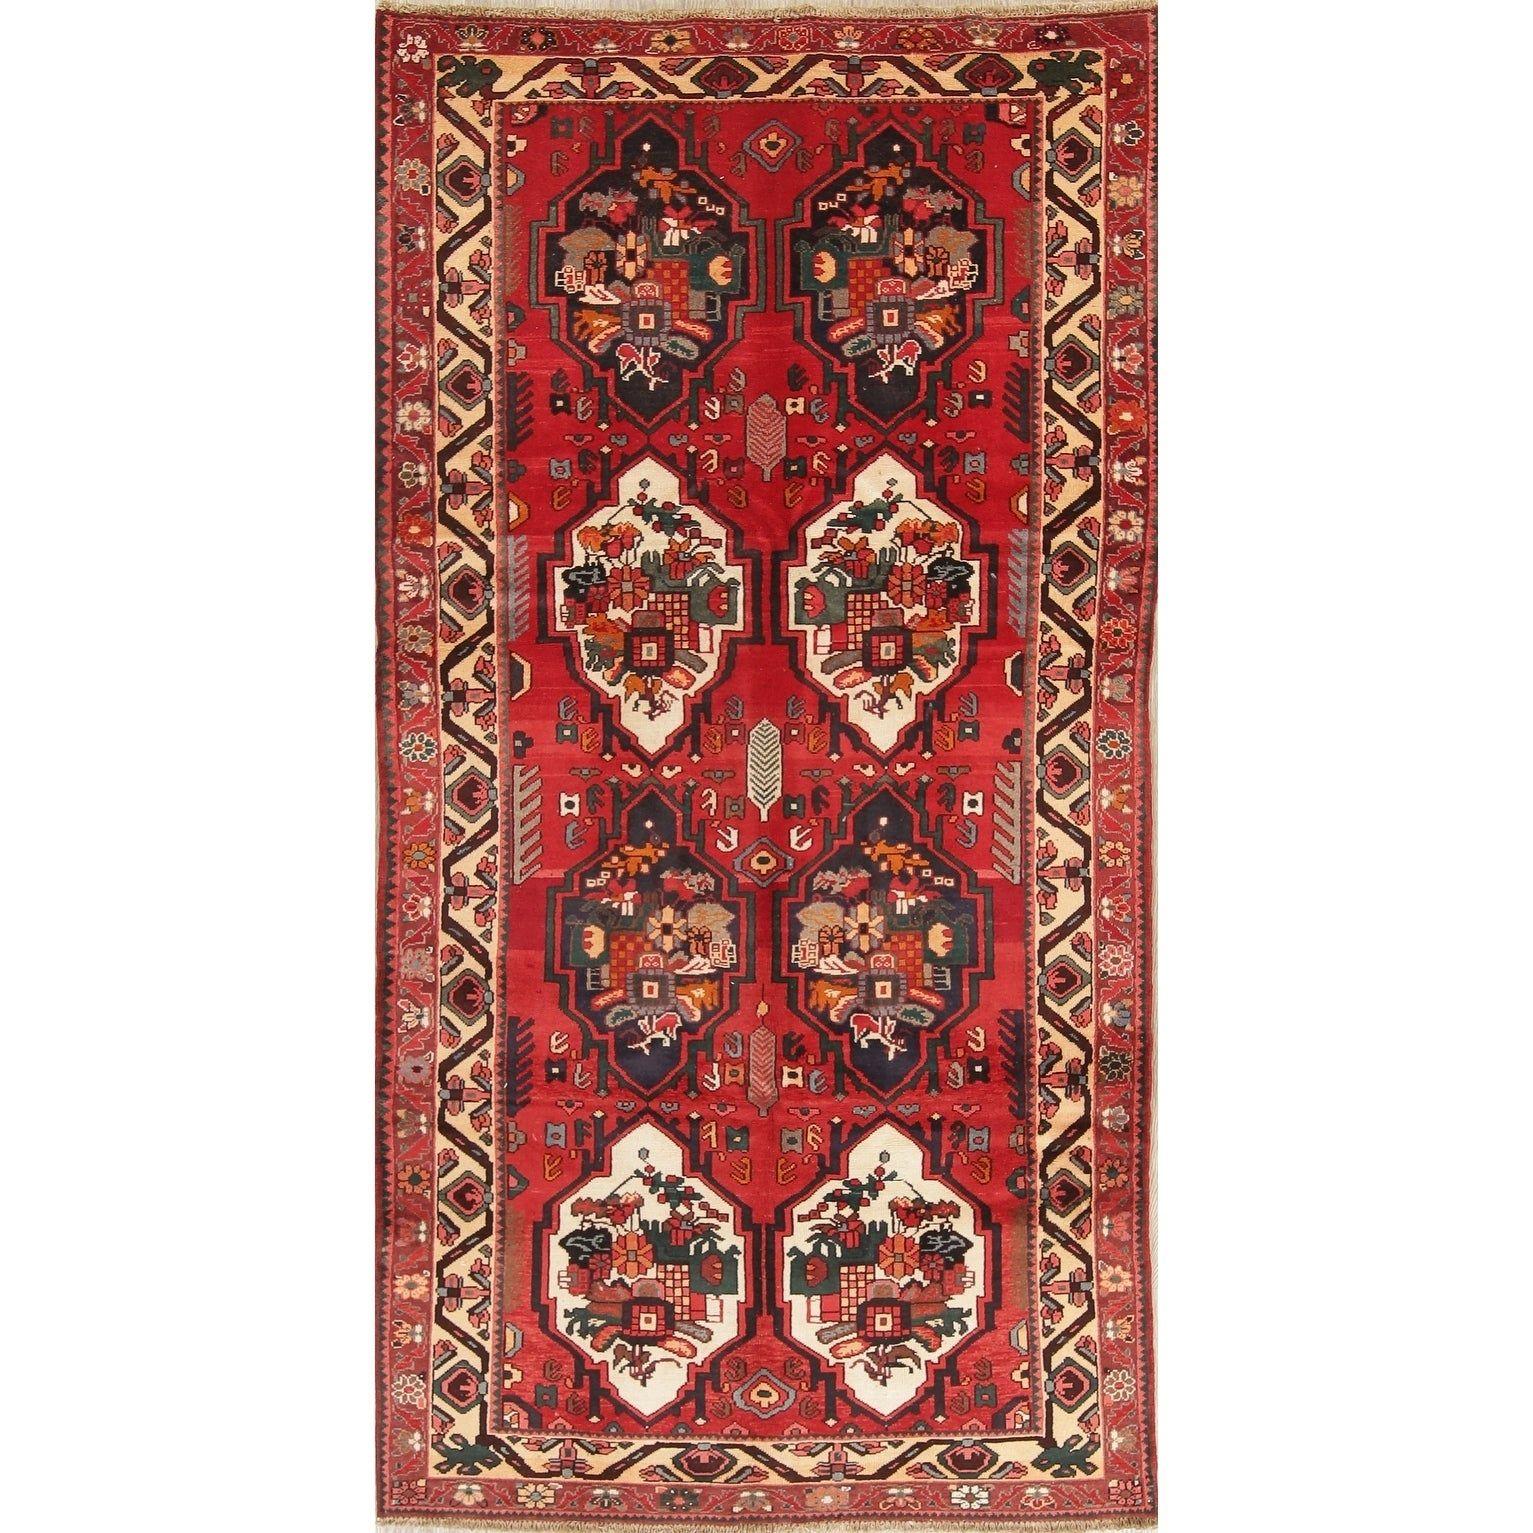 Vintage Bakhtiari Oriental Hand Knotted Wool Persian Rug 10 1 X 5 1 Runner Persian Rug Runners Oriental Runner Rug Colorful Rugs